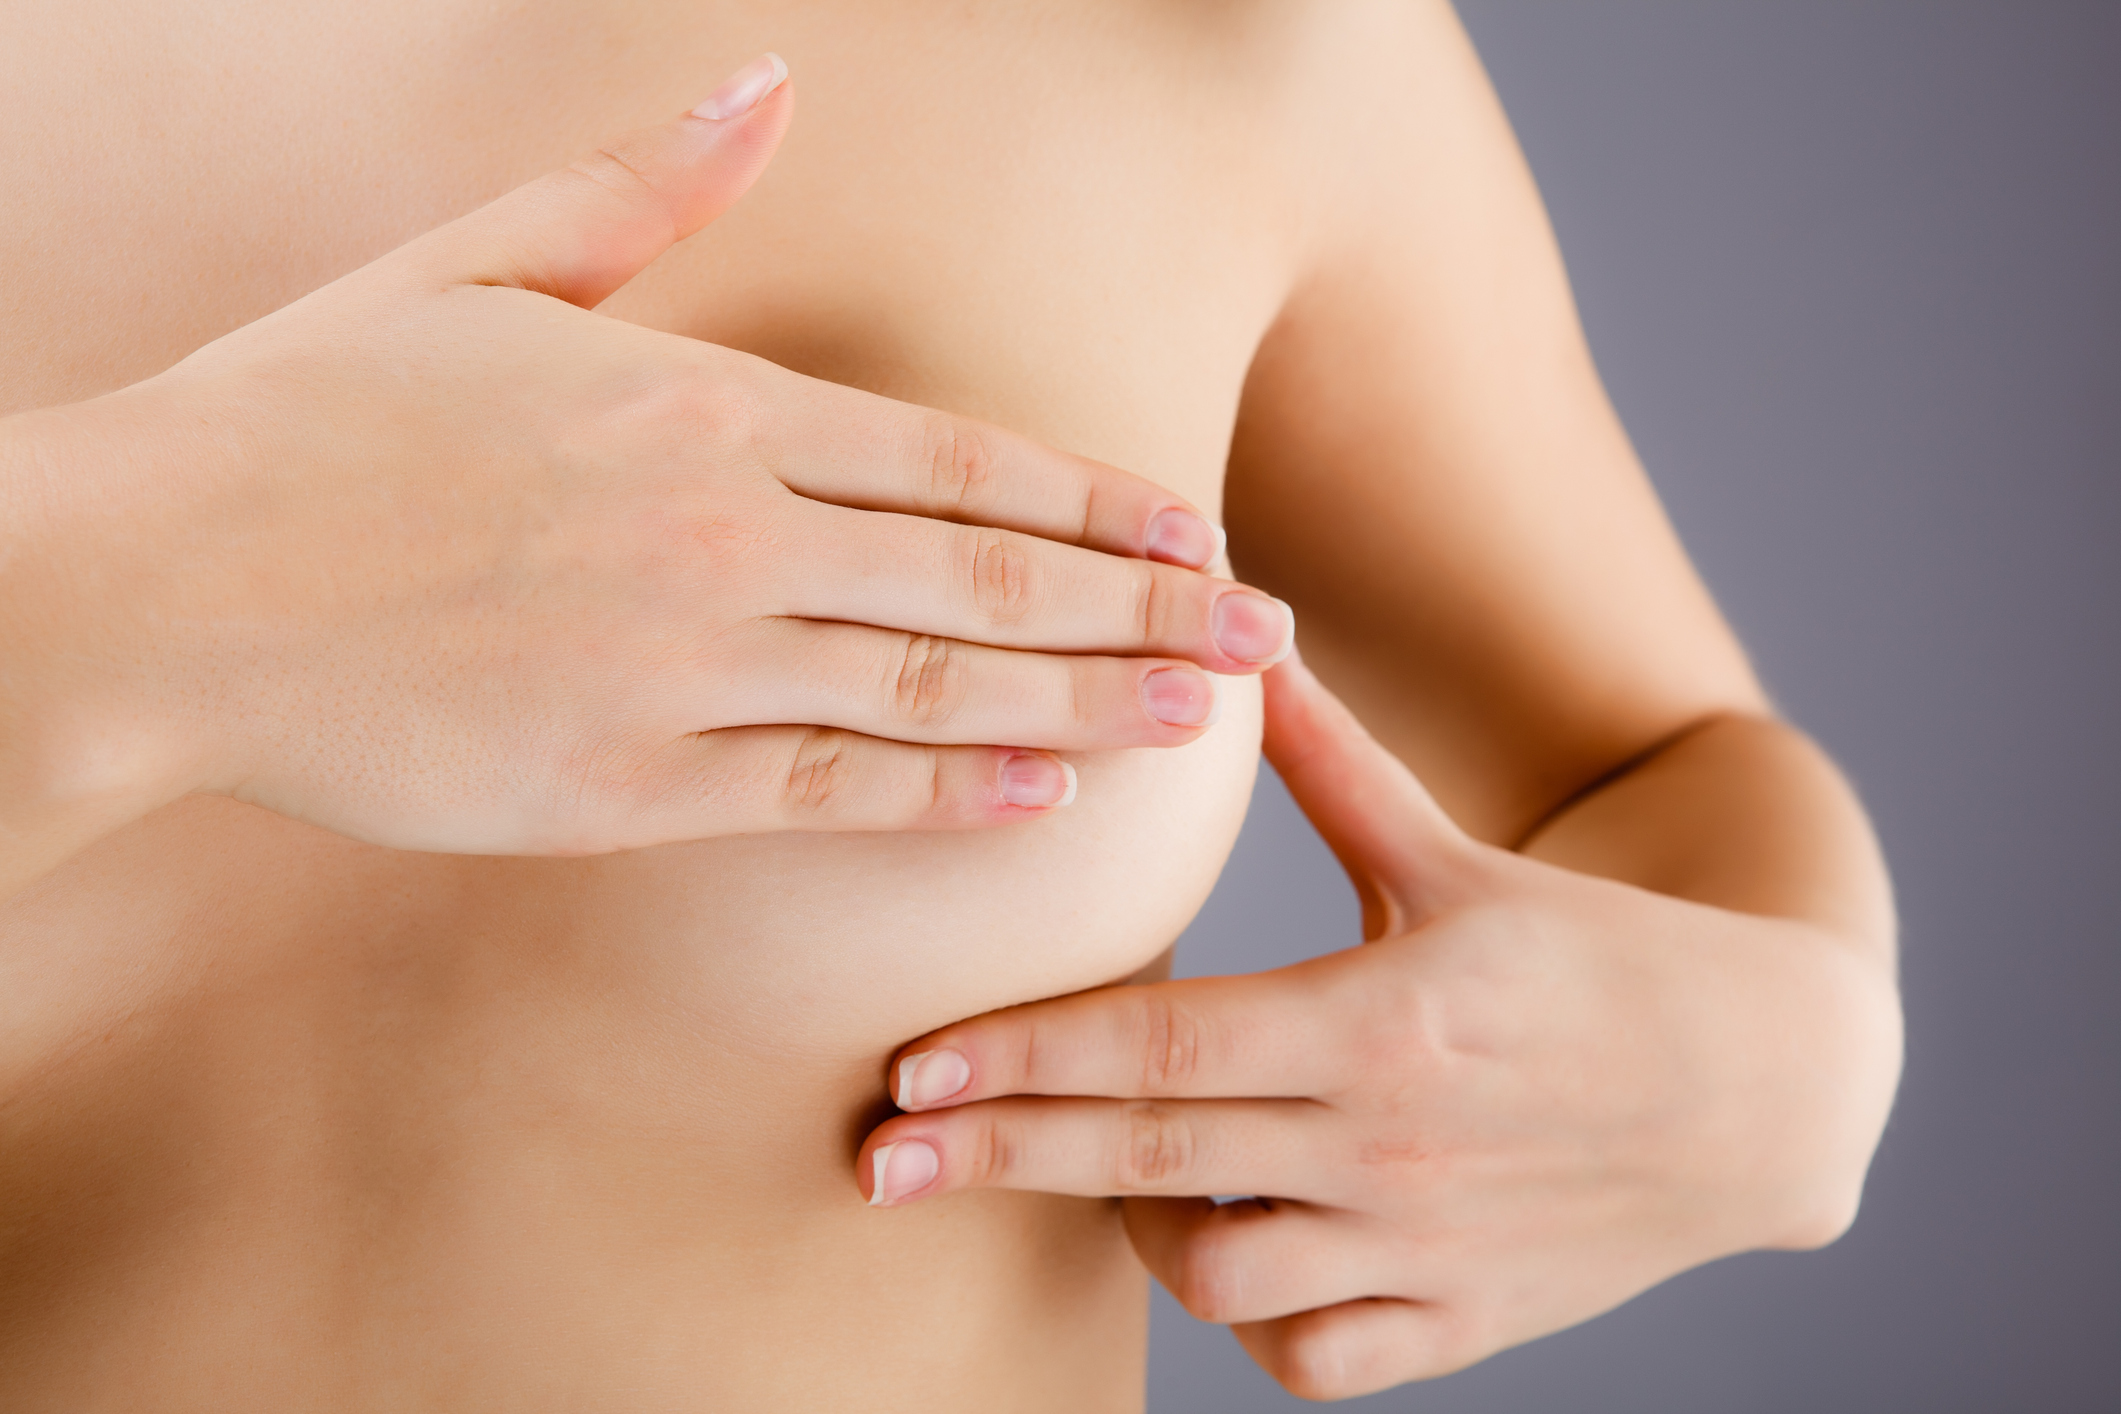 brustwarzen massage